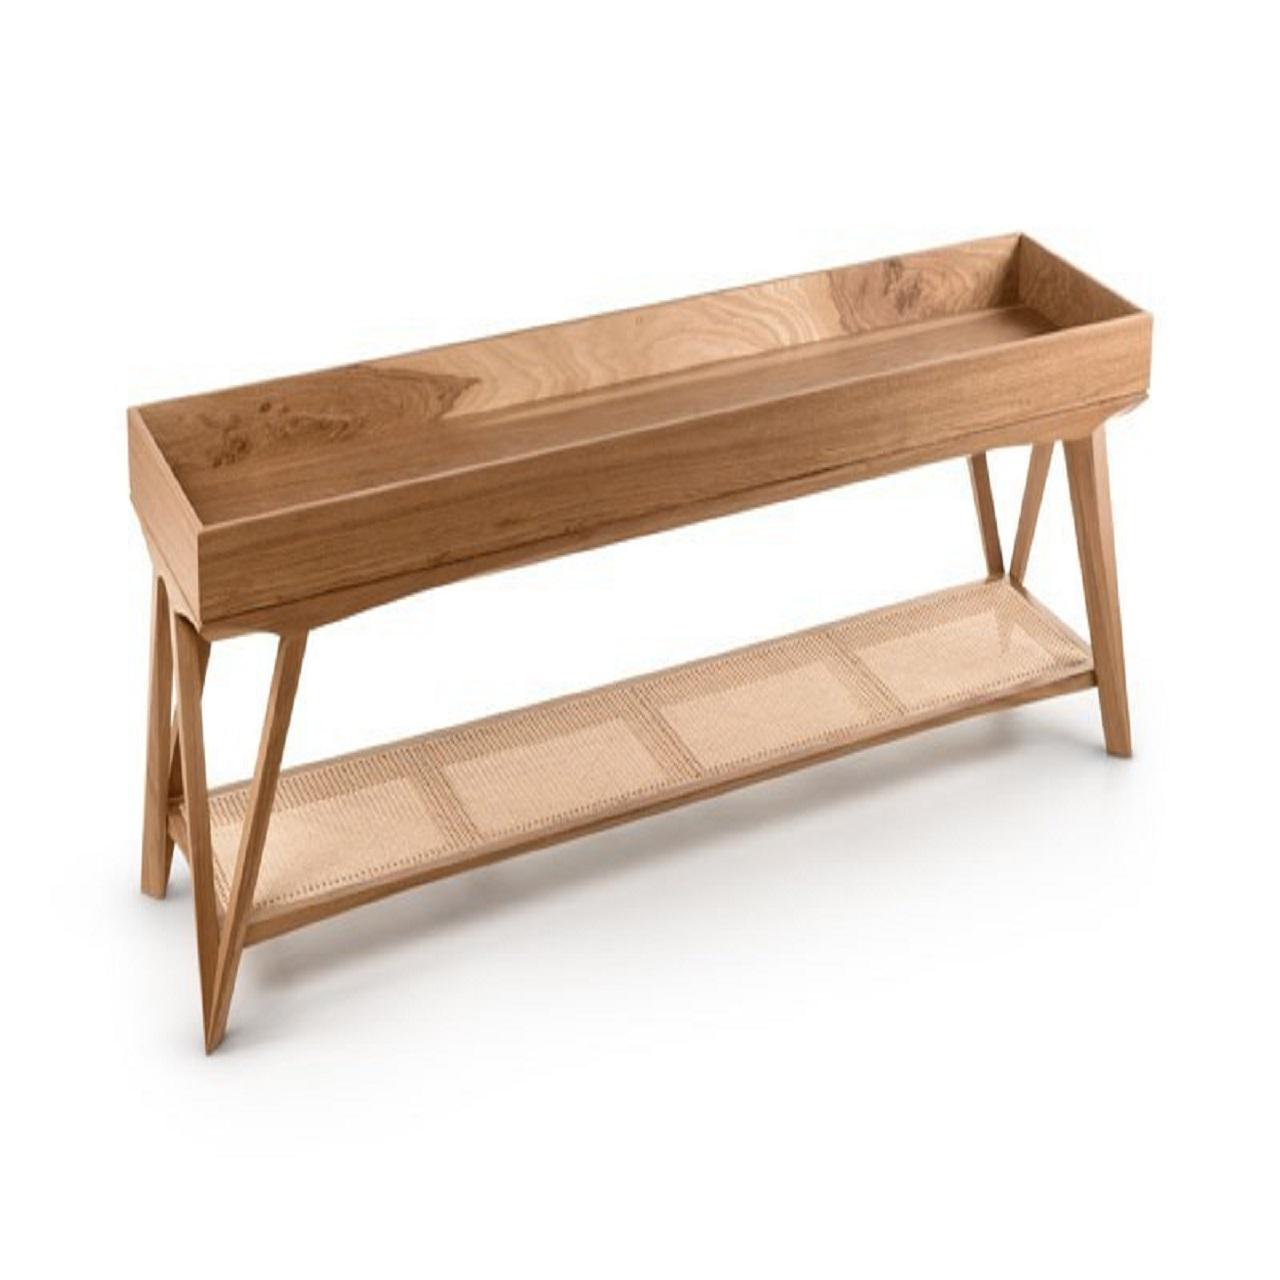 Sofa Table Air | freijó natural